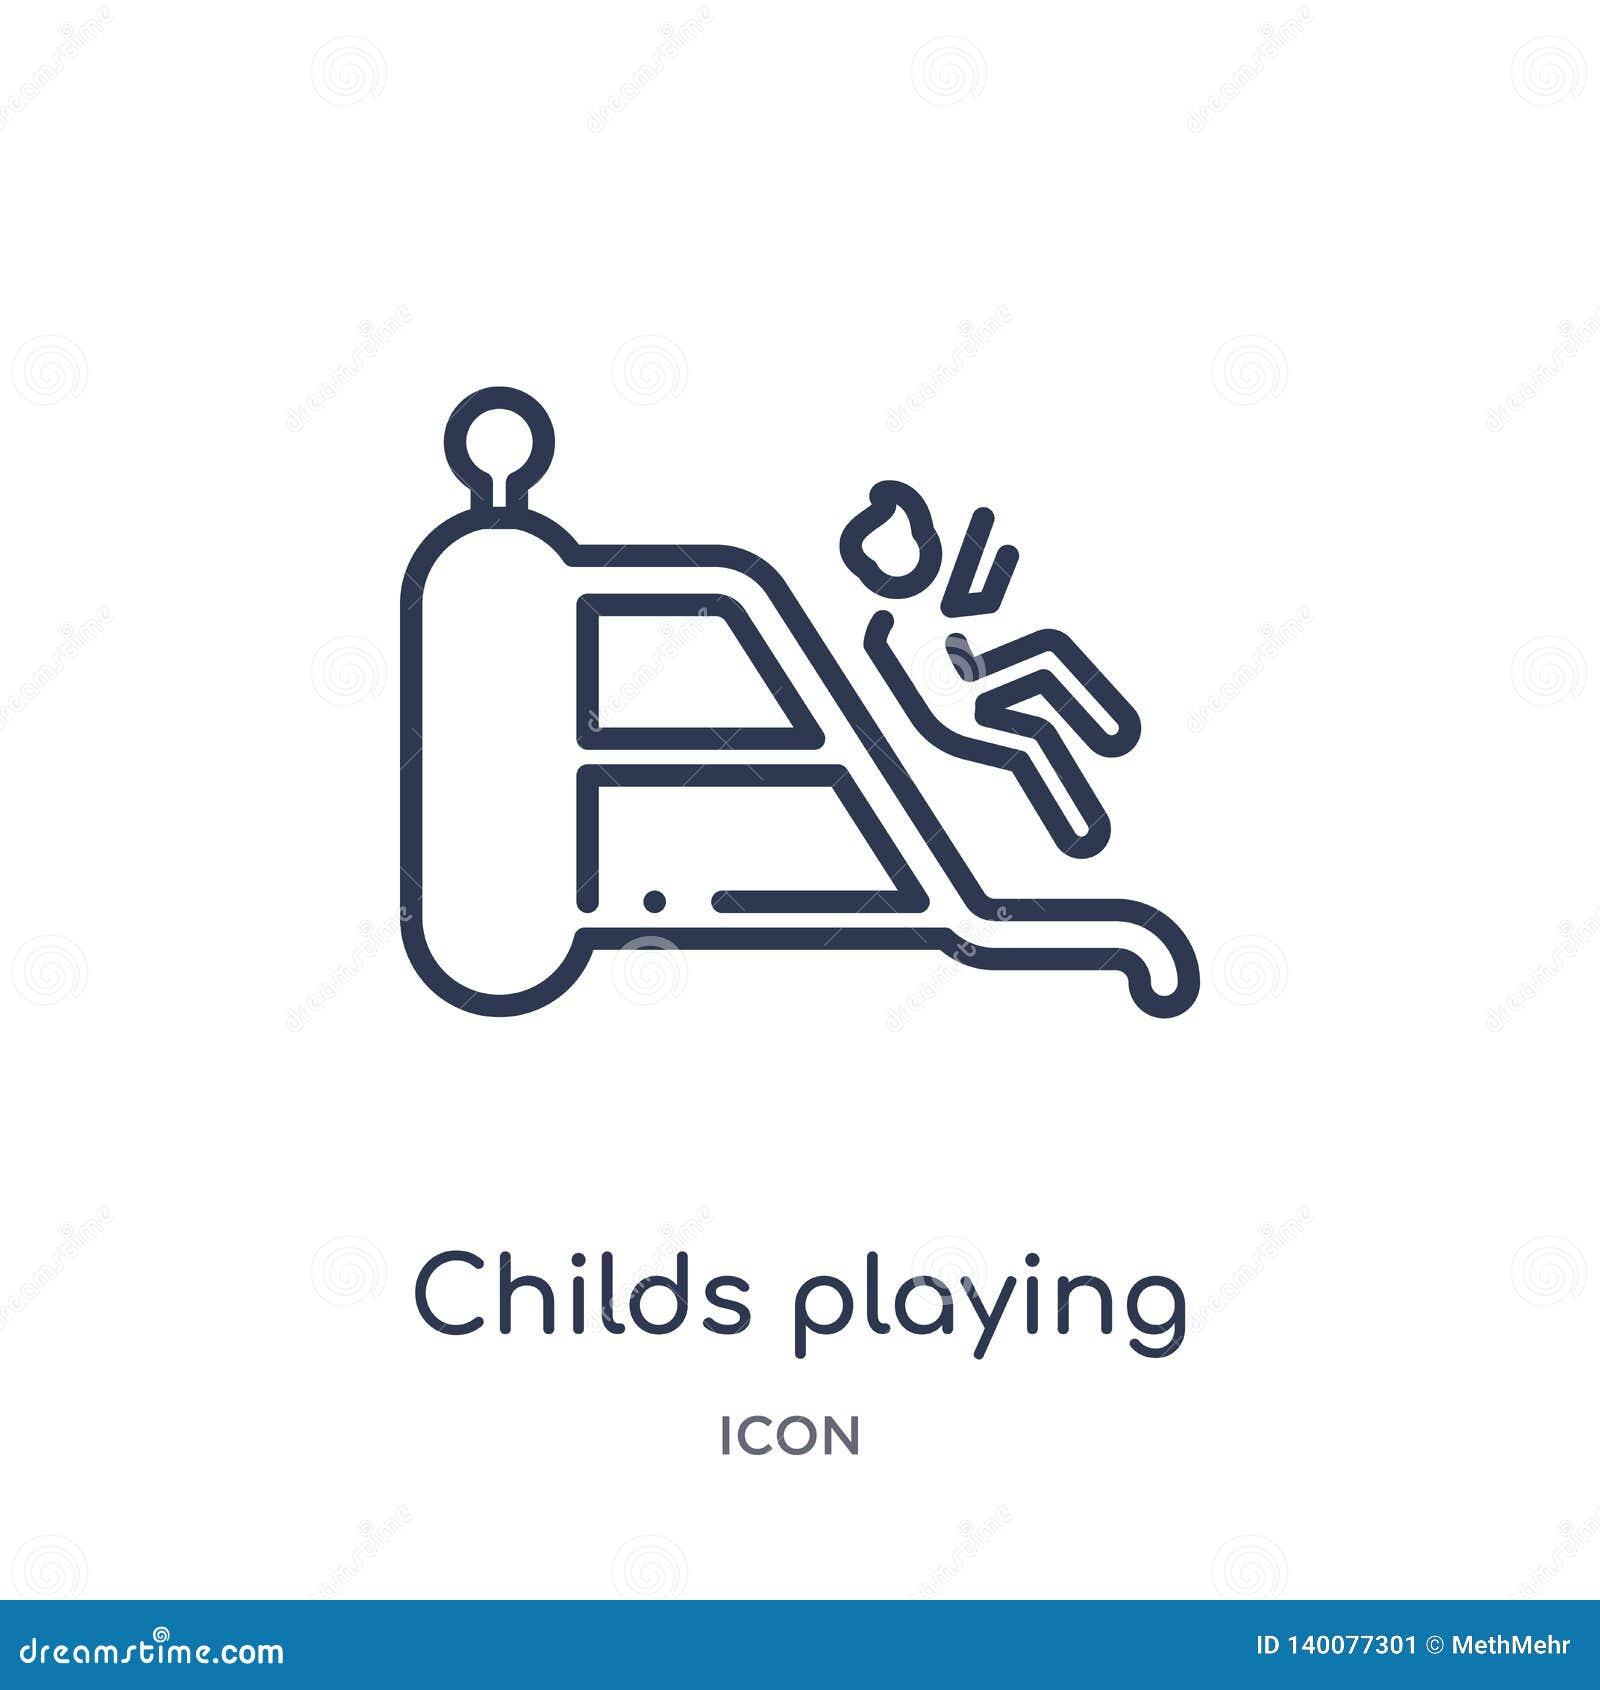 Childs παίζοντας στο εικονίδιο playgrpound από τη συλλογή περιλήψεων ανθρώπων Λεπτή γραμμή childs που παίζει στο εικονίδιο playgr